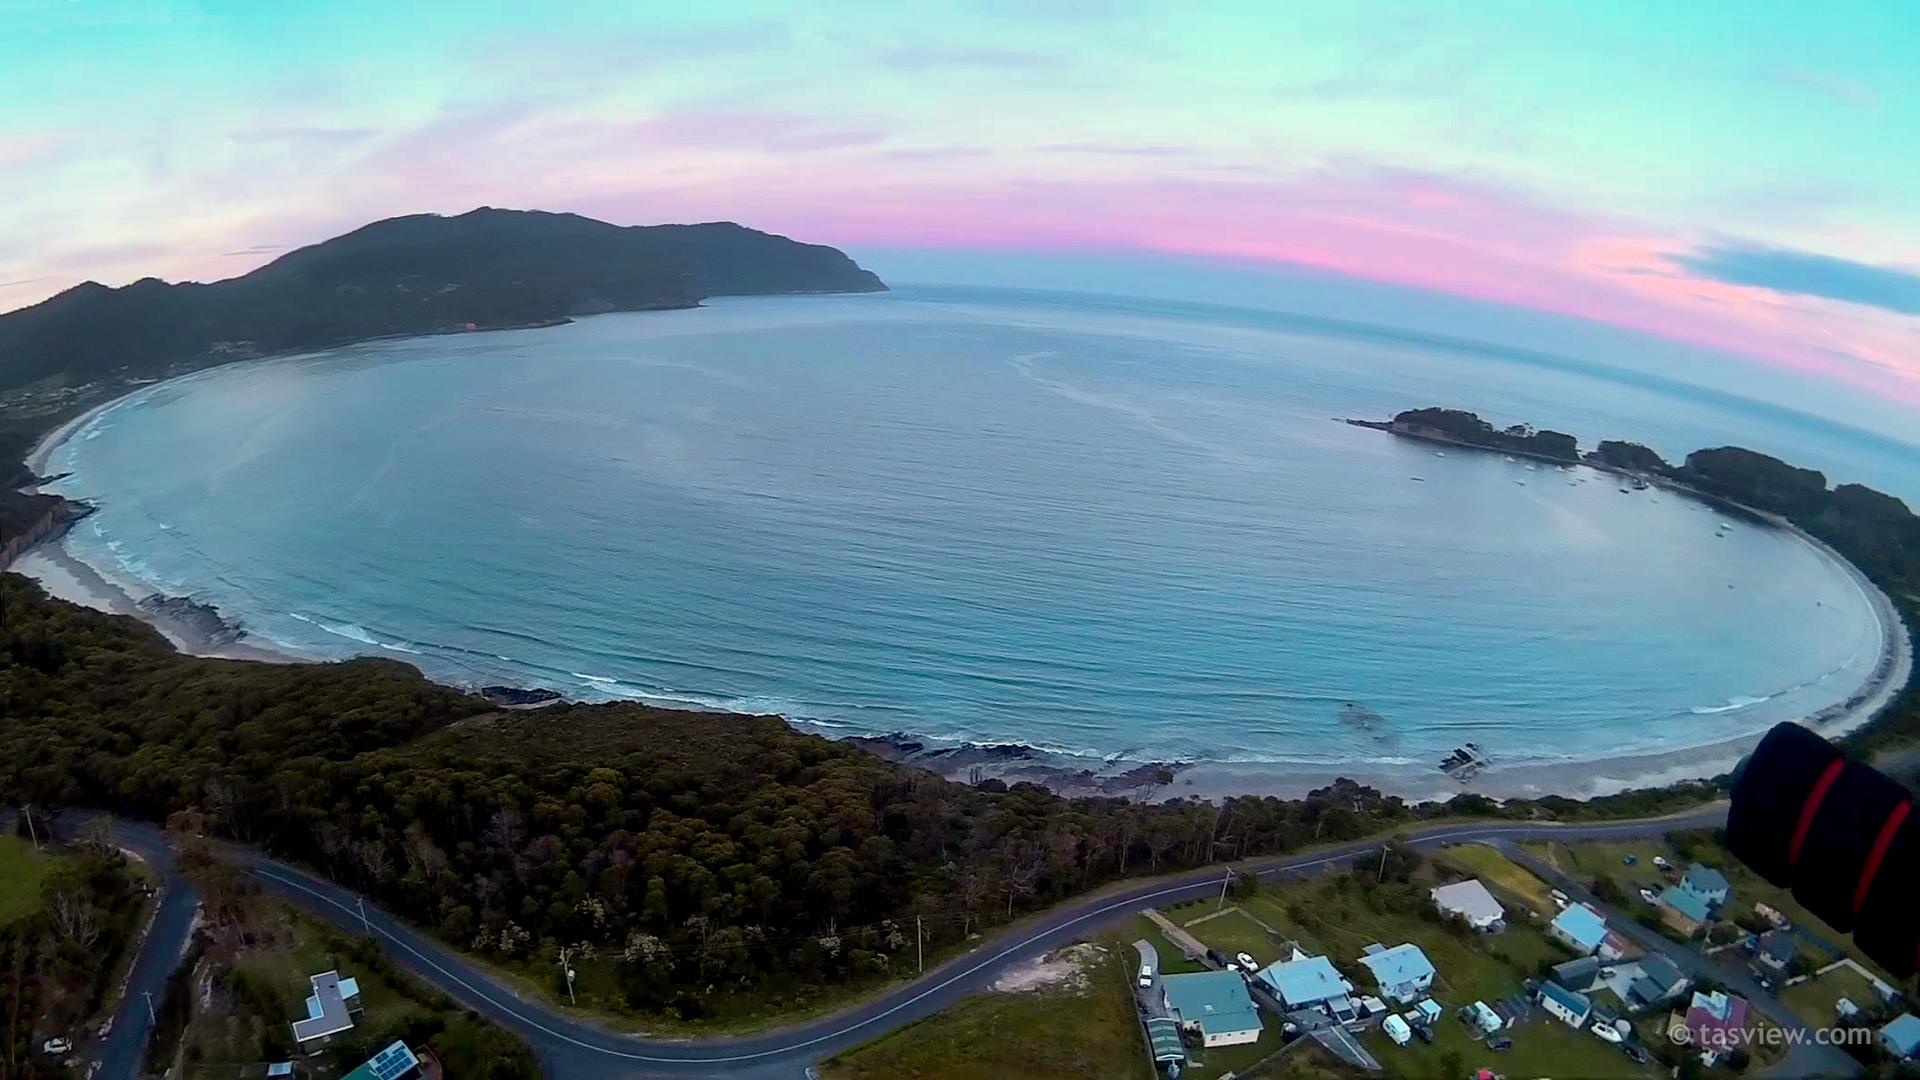 Eaglehawk Neck Gateway To The Tasman Peninsula